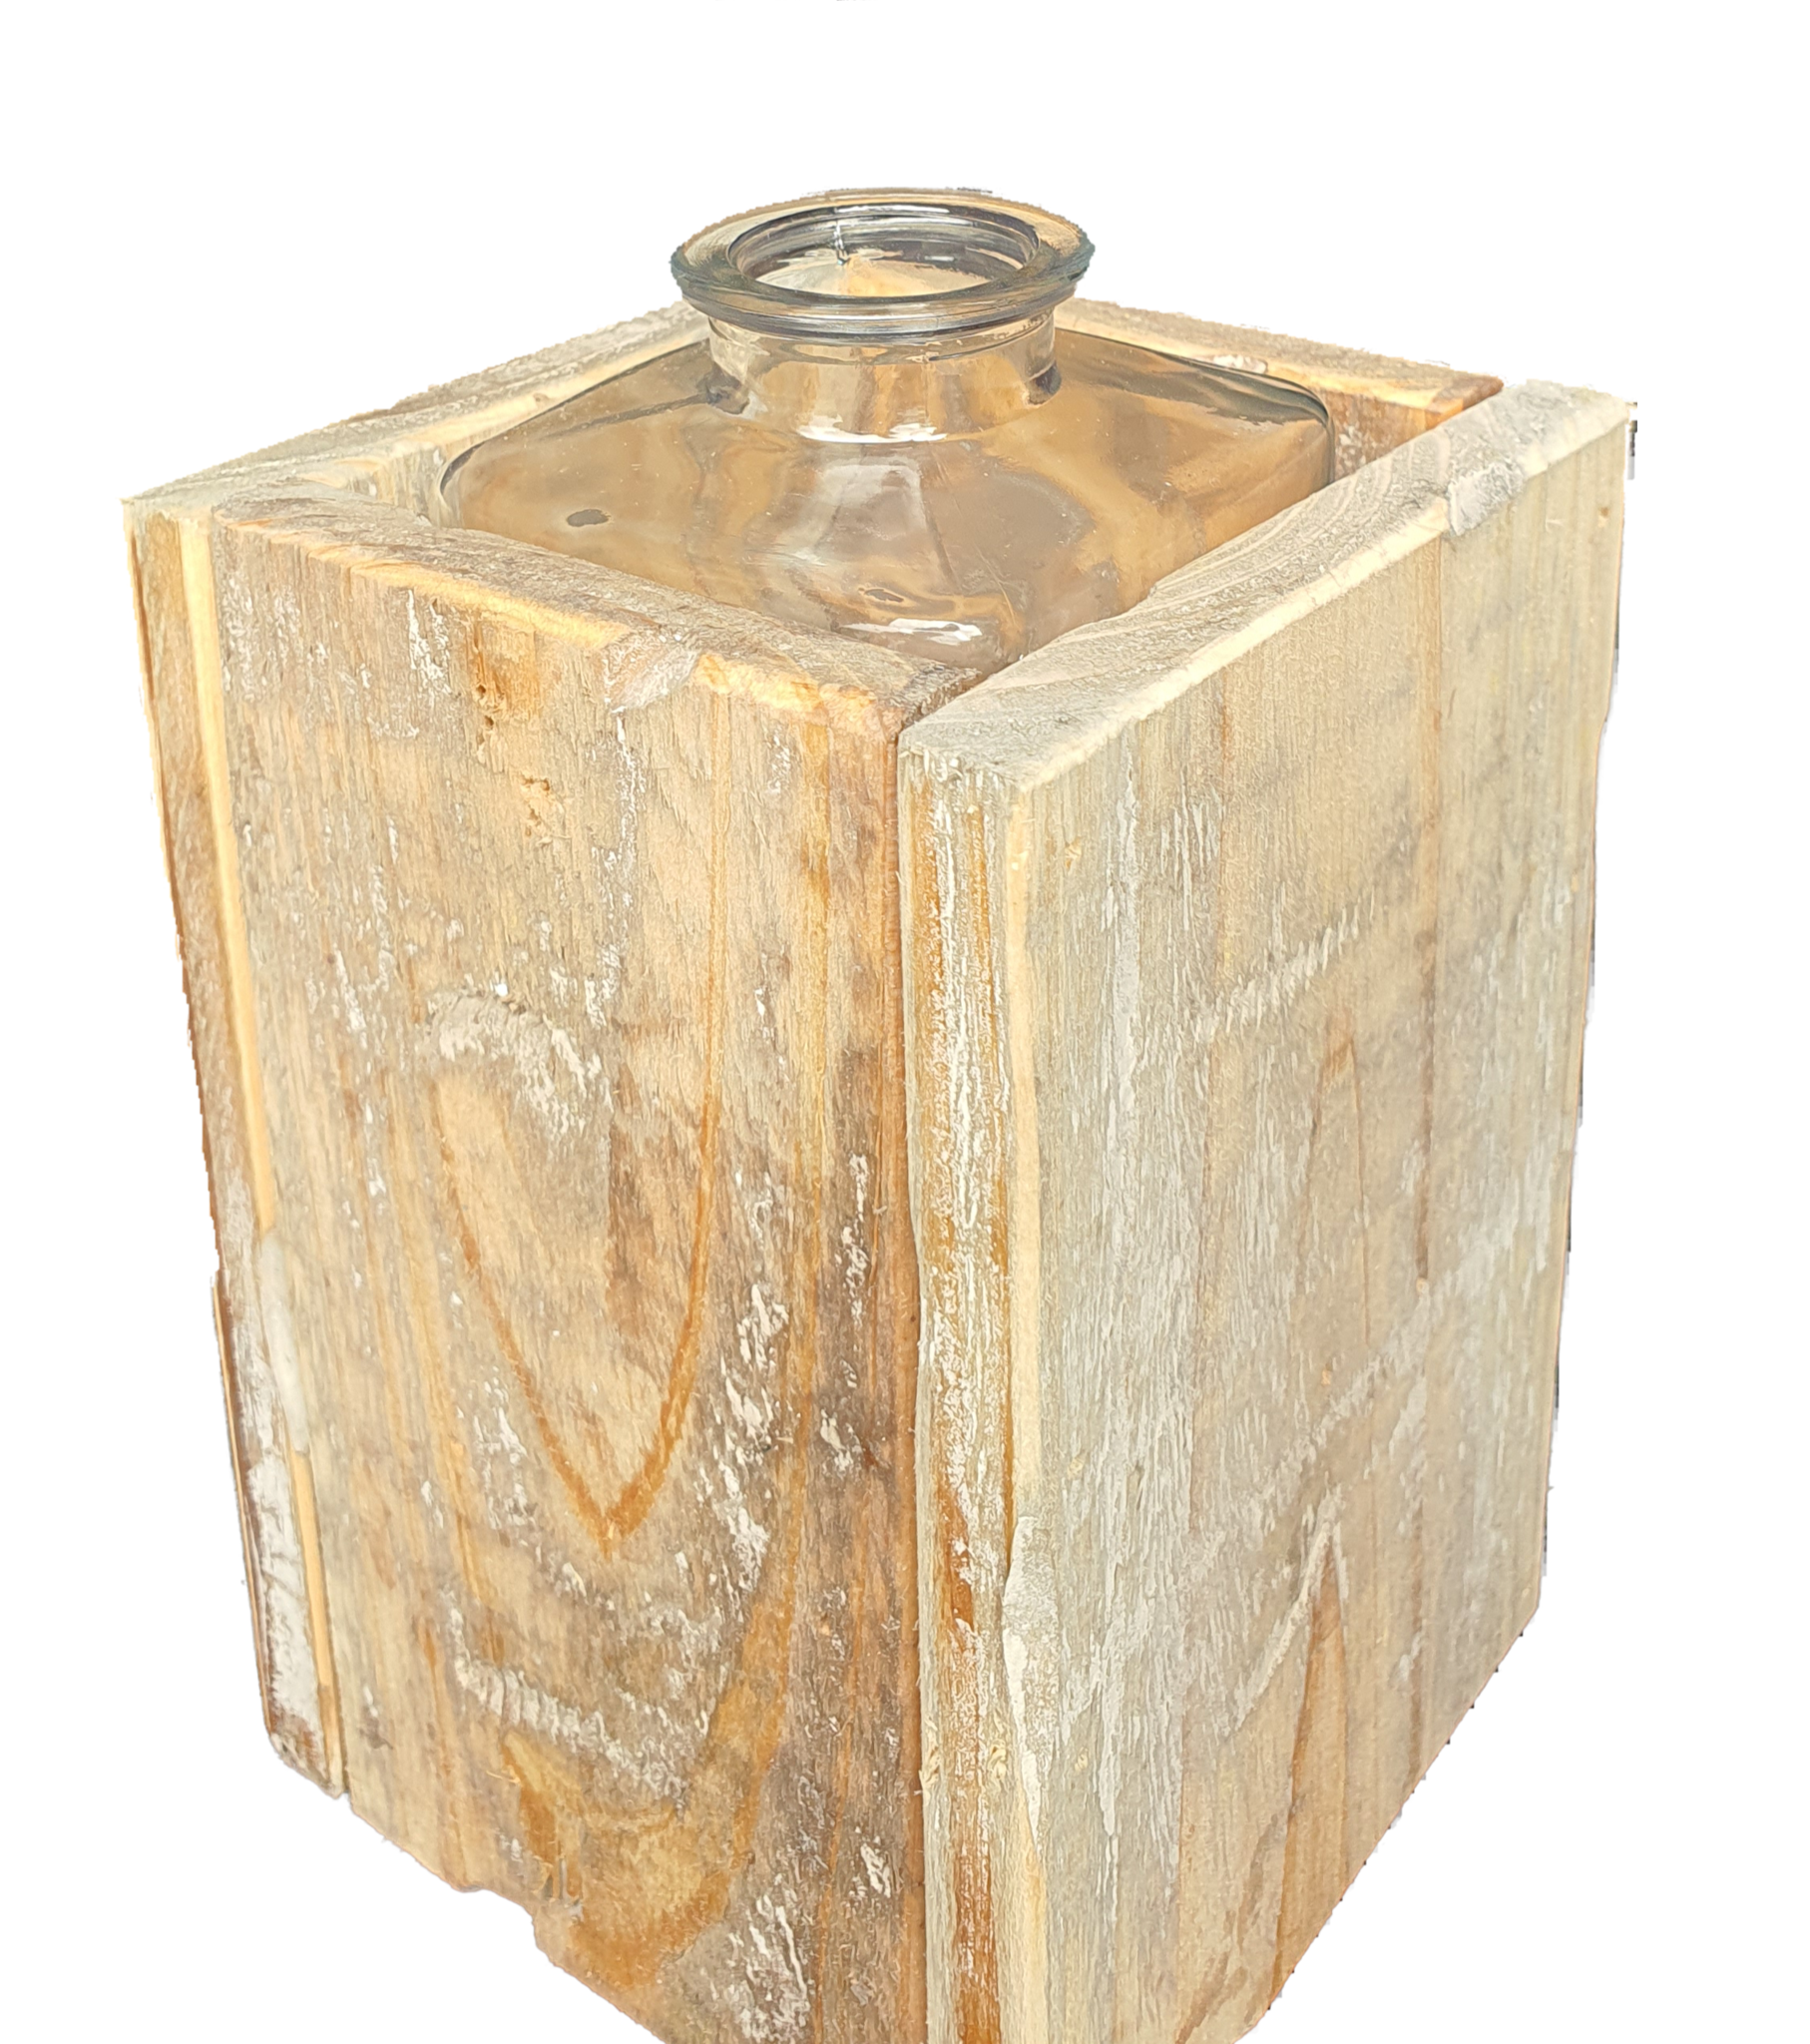 pot old dutchglass hold 2 sides 15-5